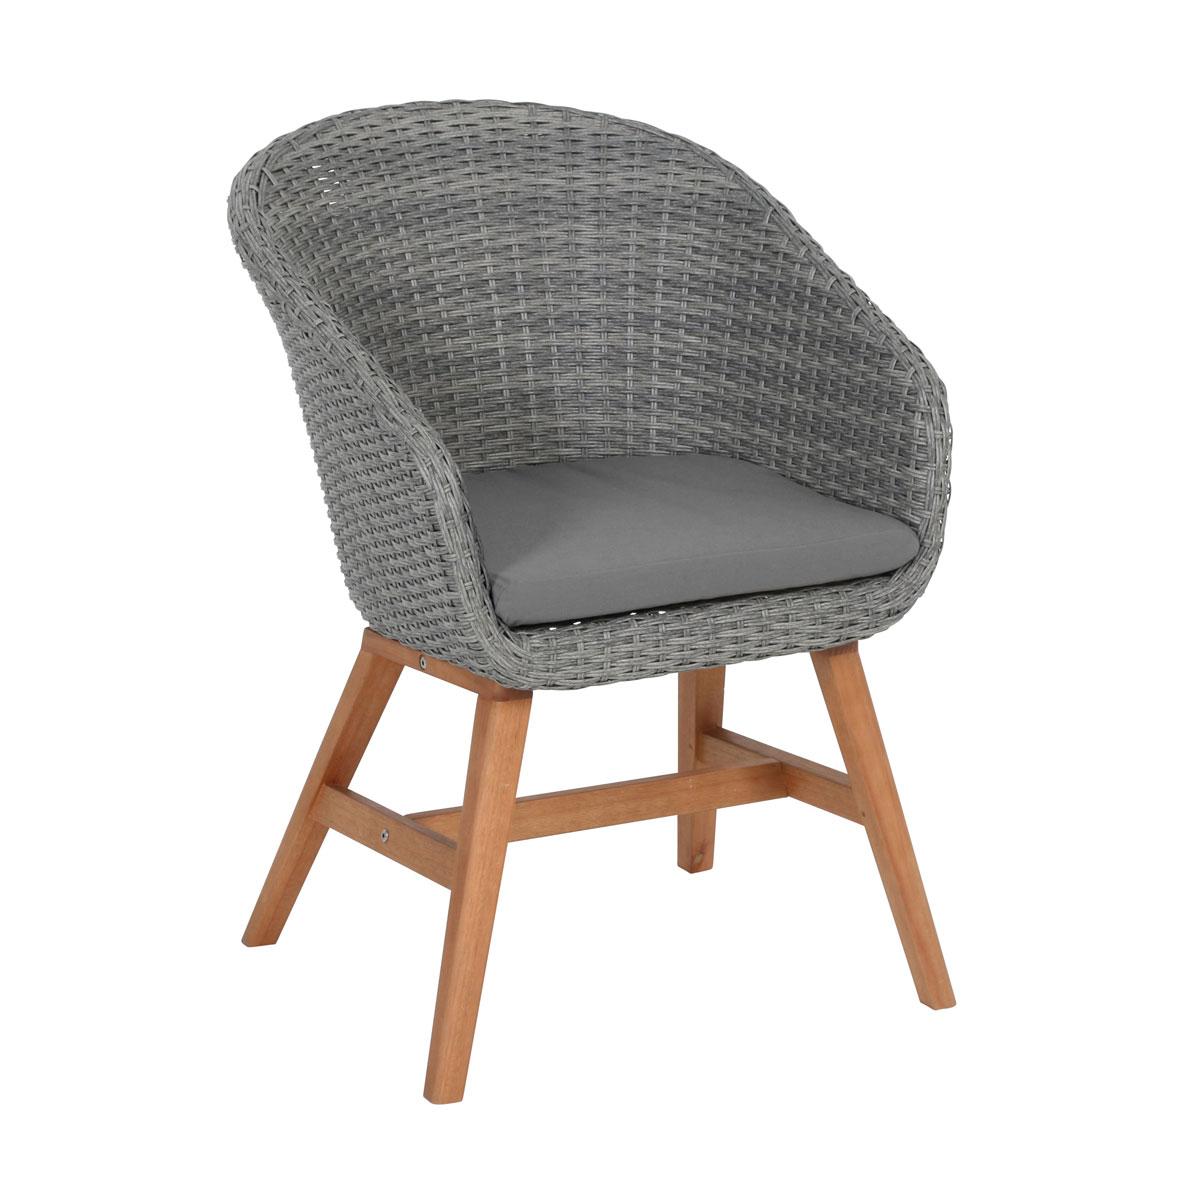 "Gartenstühle - Sessel ""Madeira"", grau  - Onlineshop Hellweg"